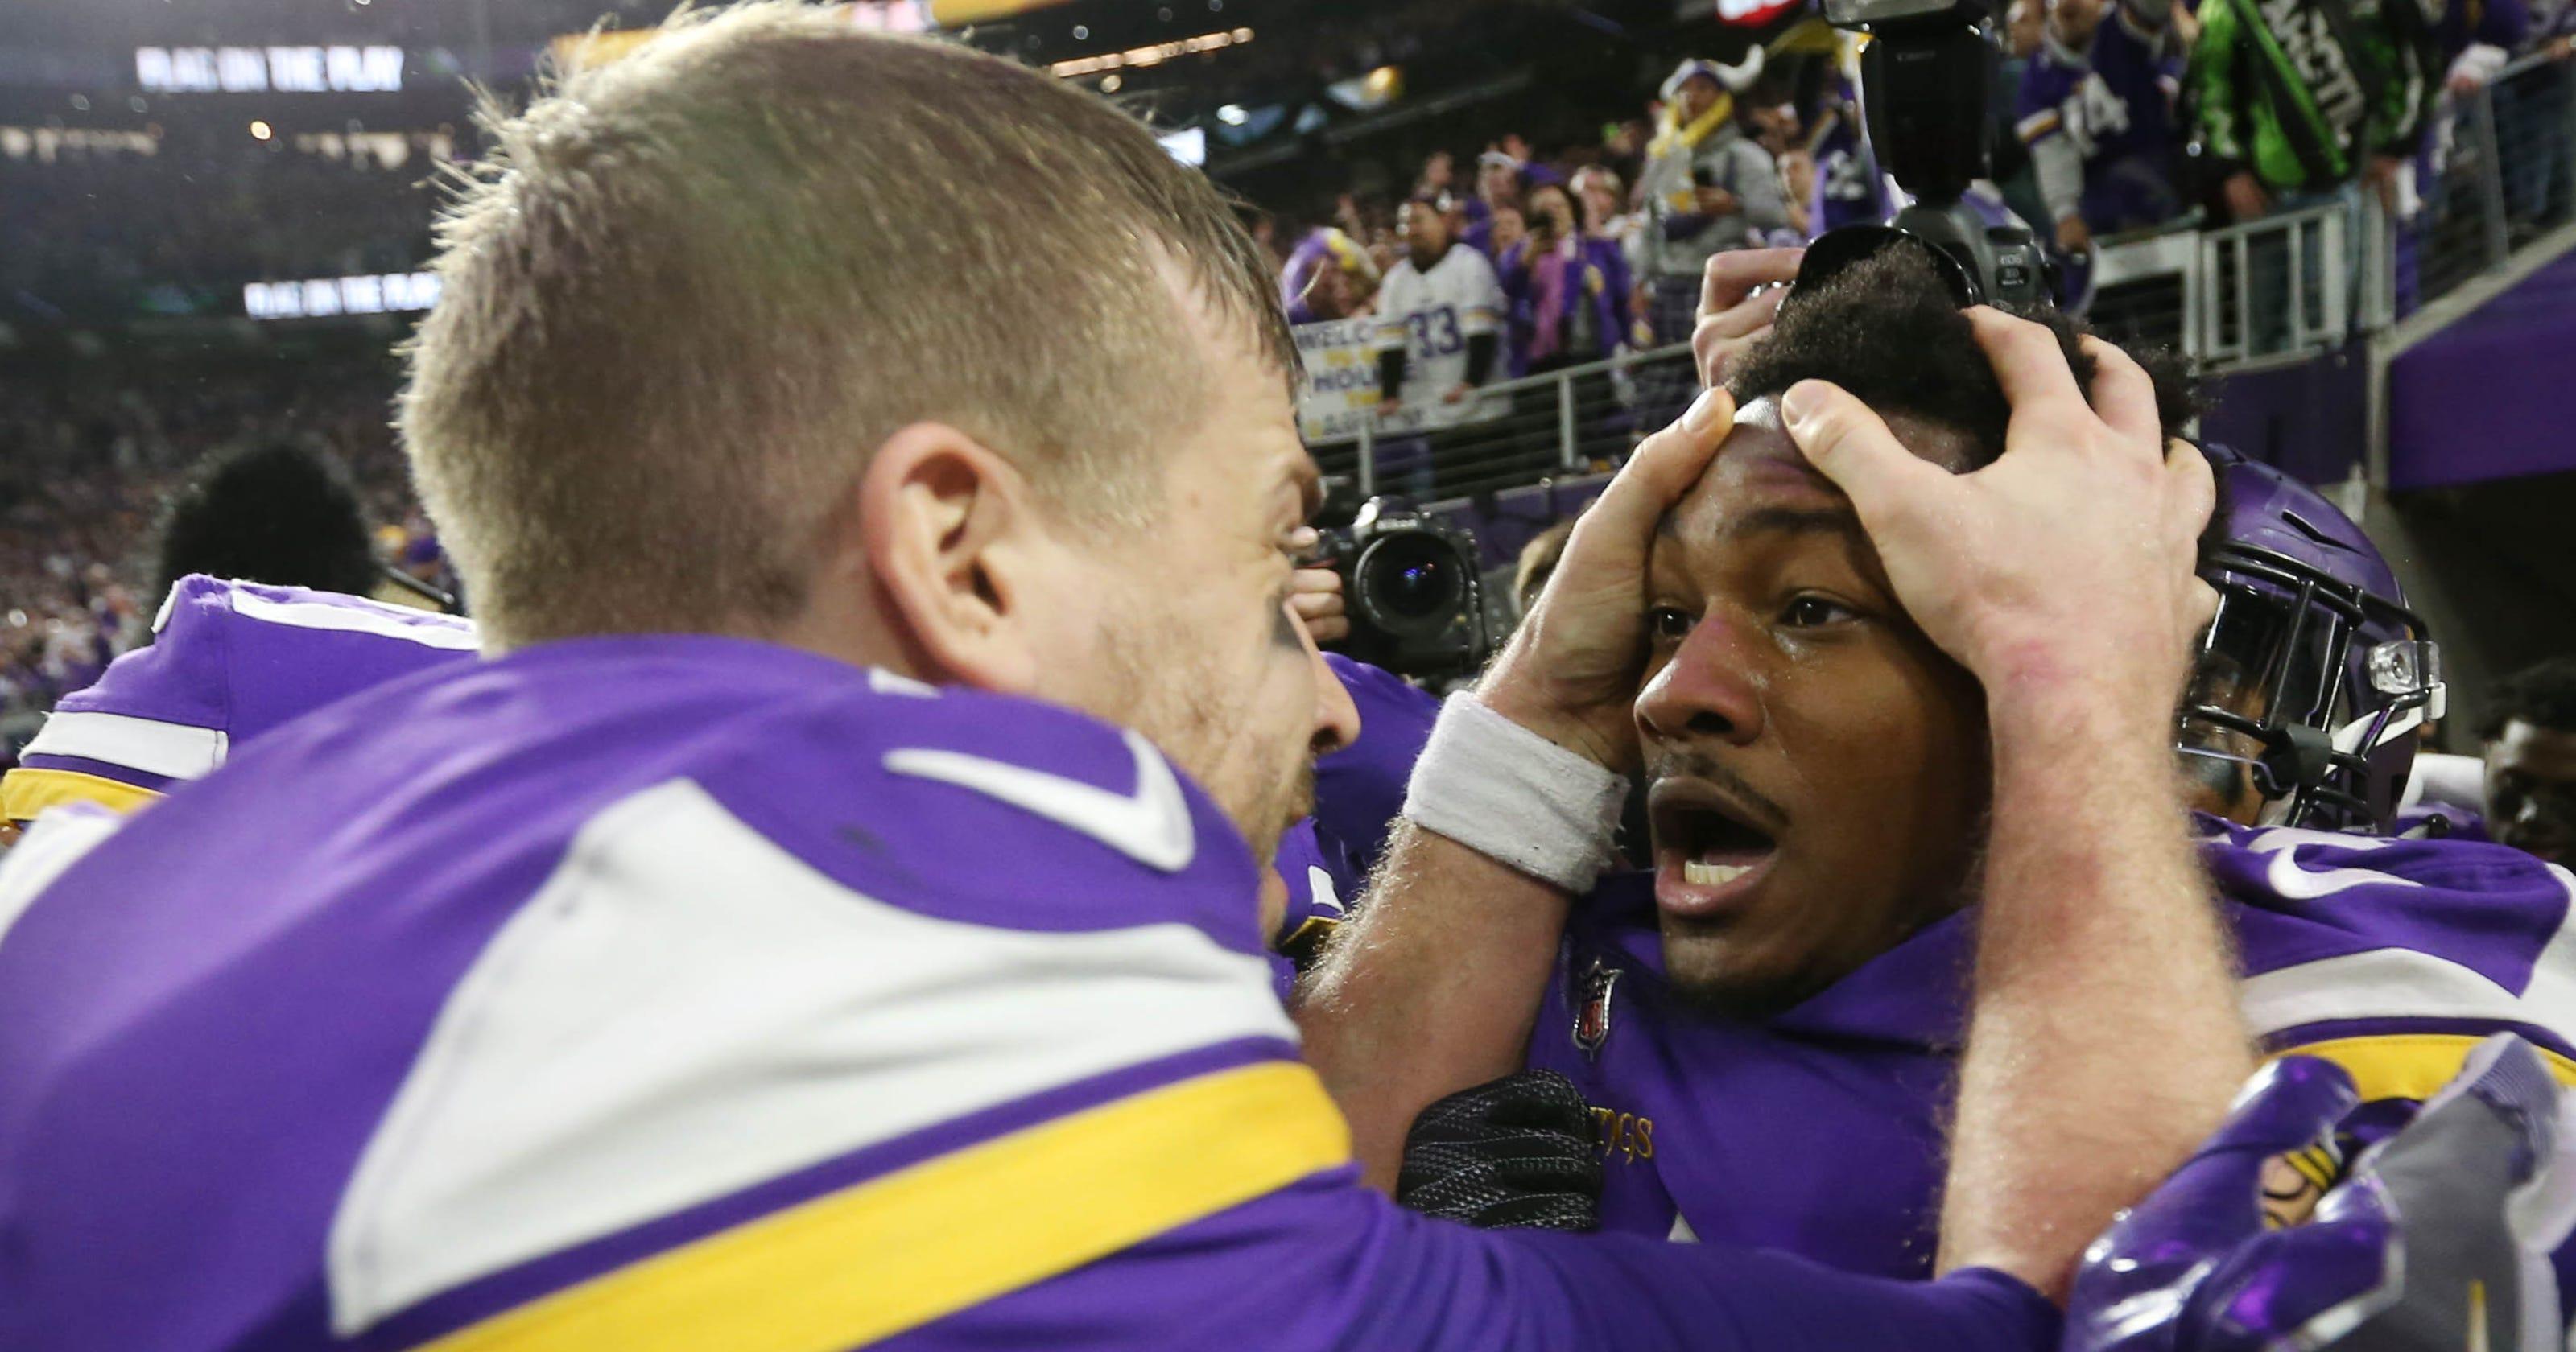 Crazy Ending To Vikings Saints Game Has Major Impact In Las Vegas